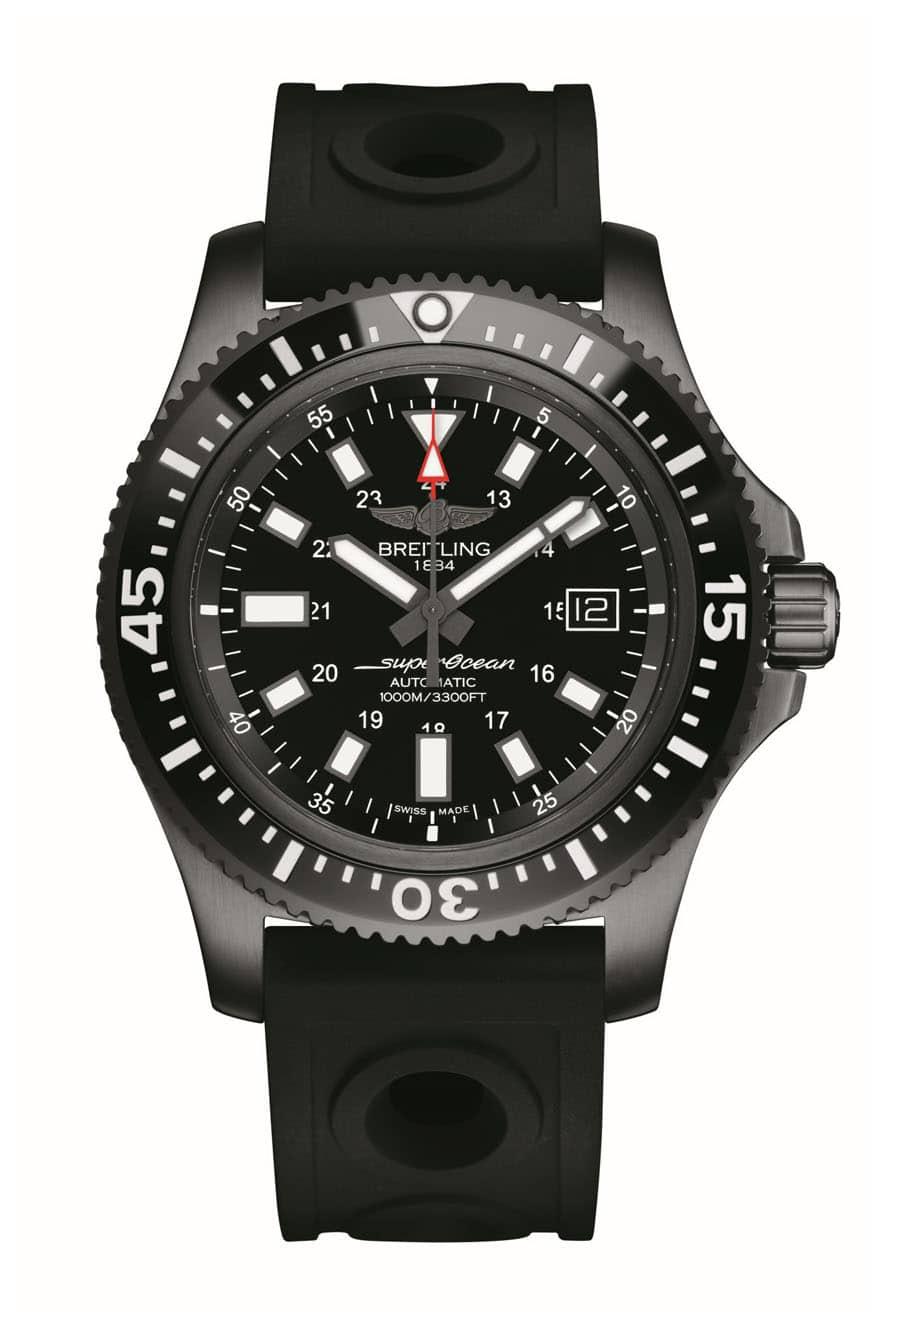 Taucheruhr Breitling Superocean 44 Special